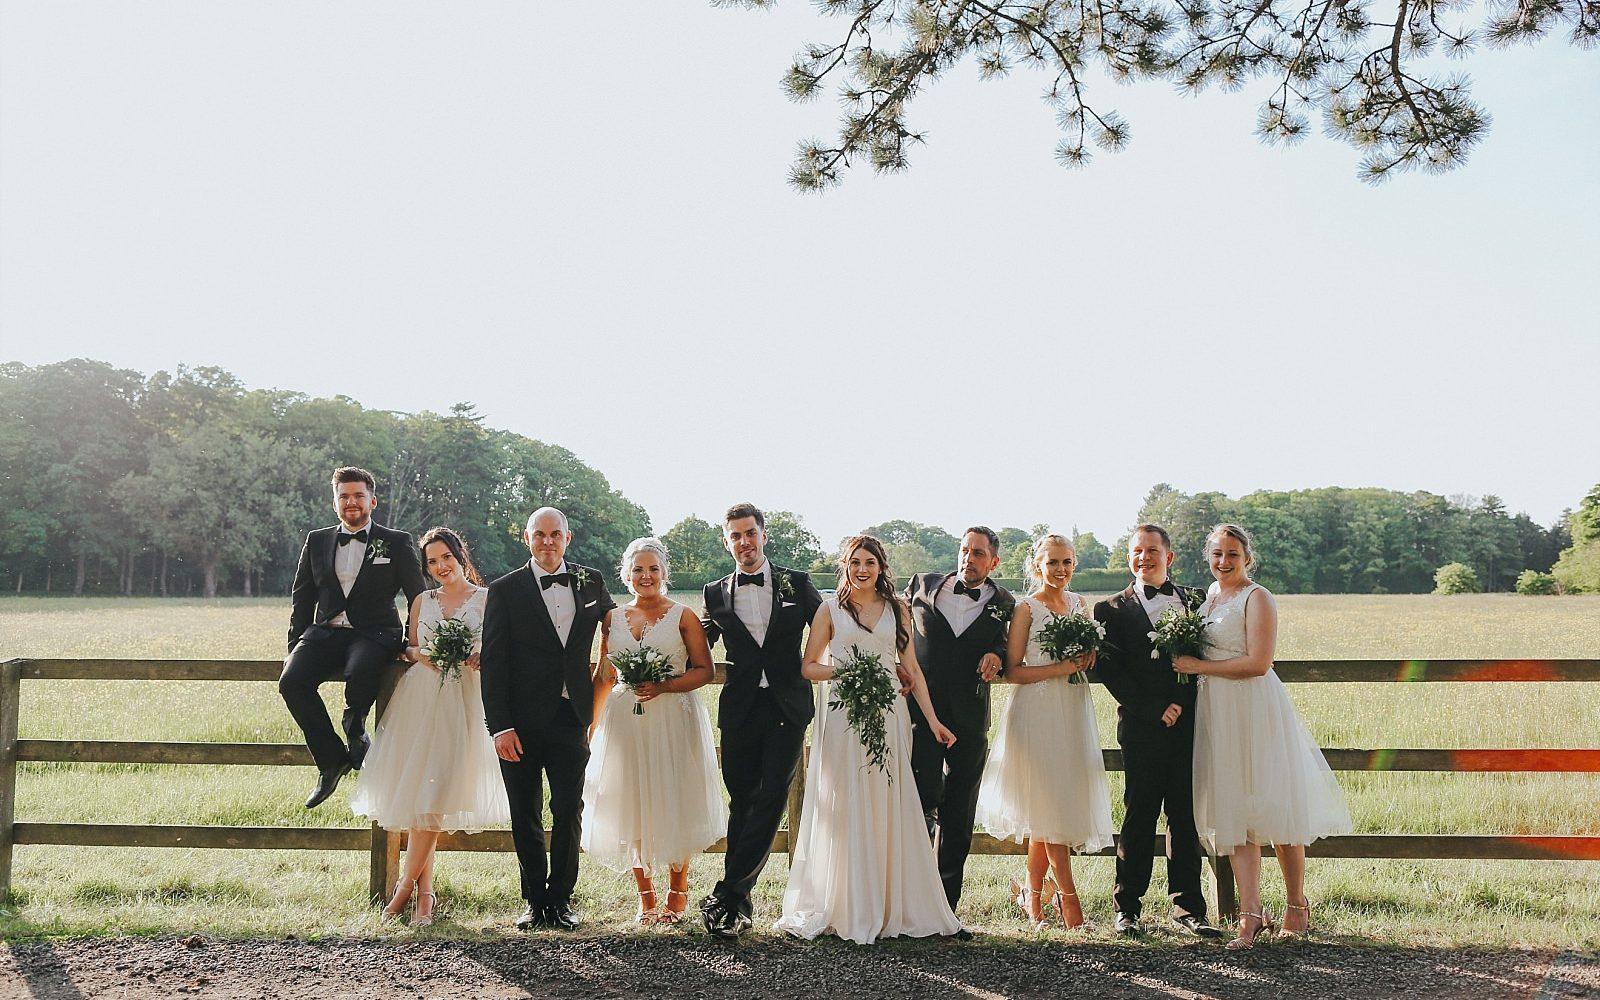 Thornton-Manor-Wedding-Photographer-embee-Photography-Liverpool-0230